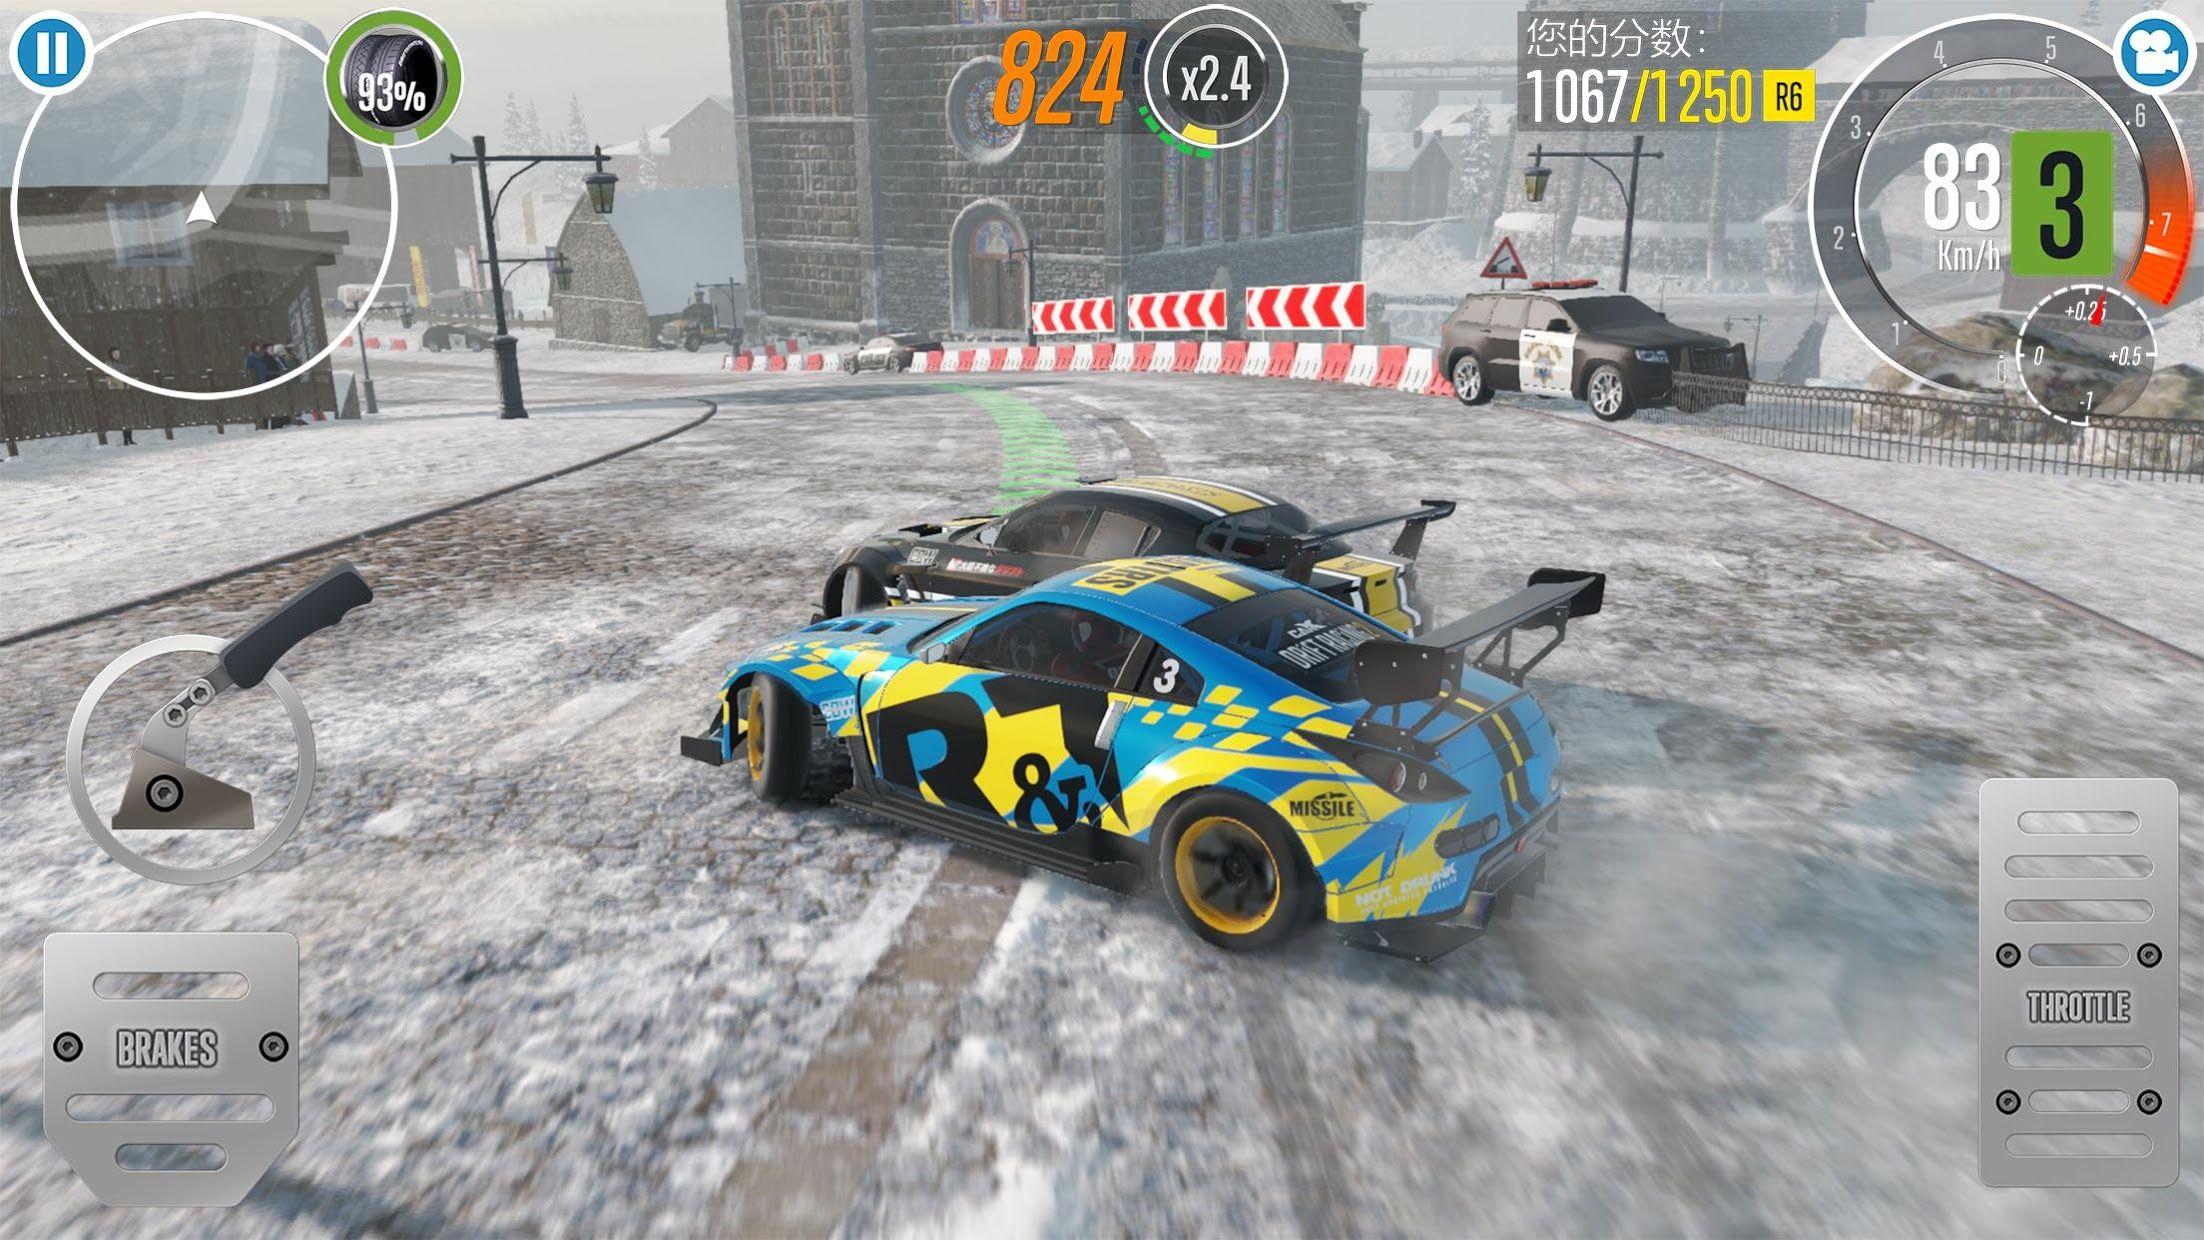 CarX 漂移赛车 2 游戏截图2